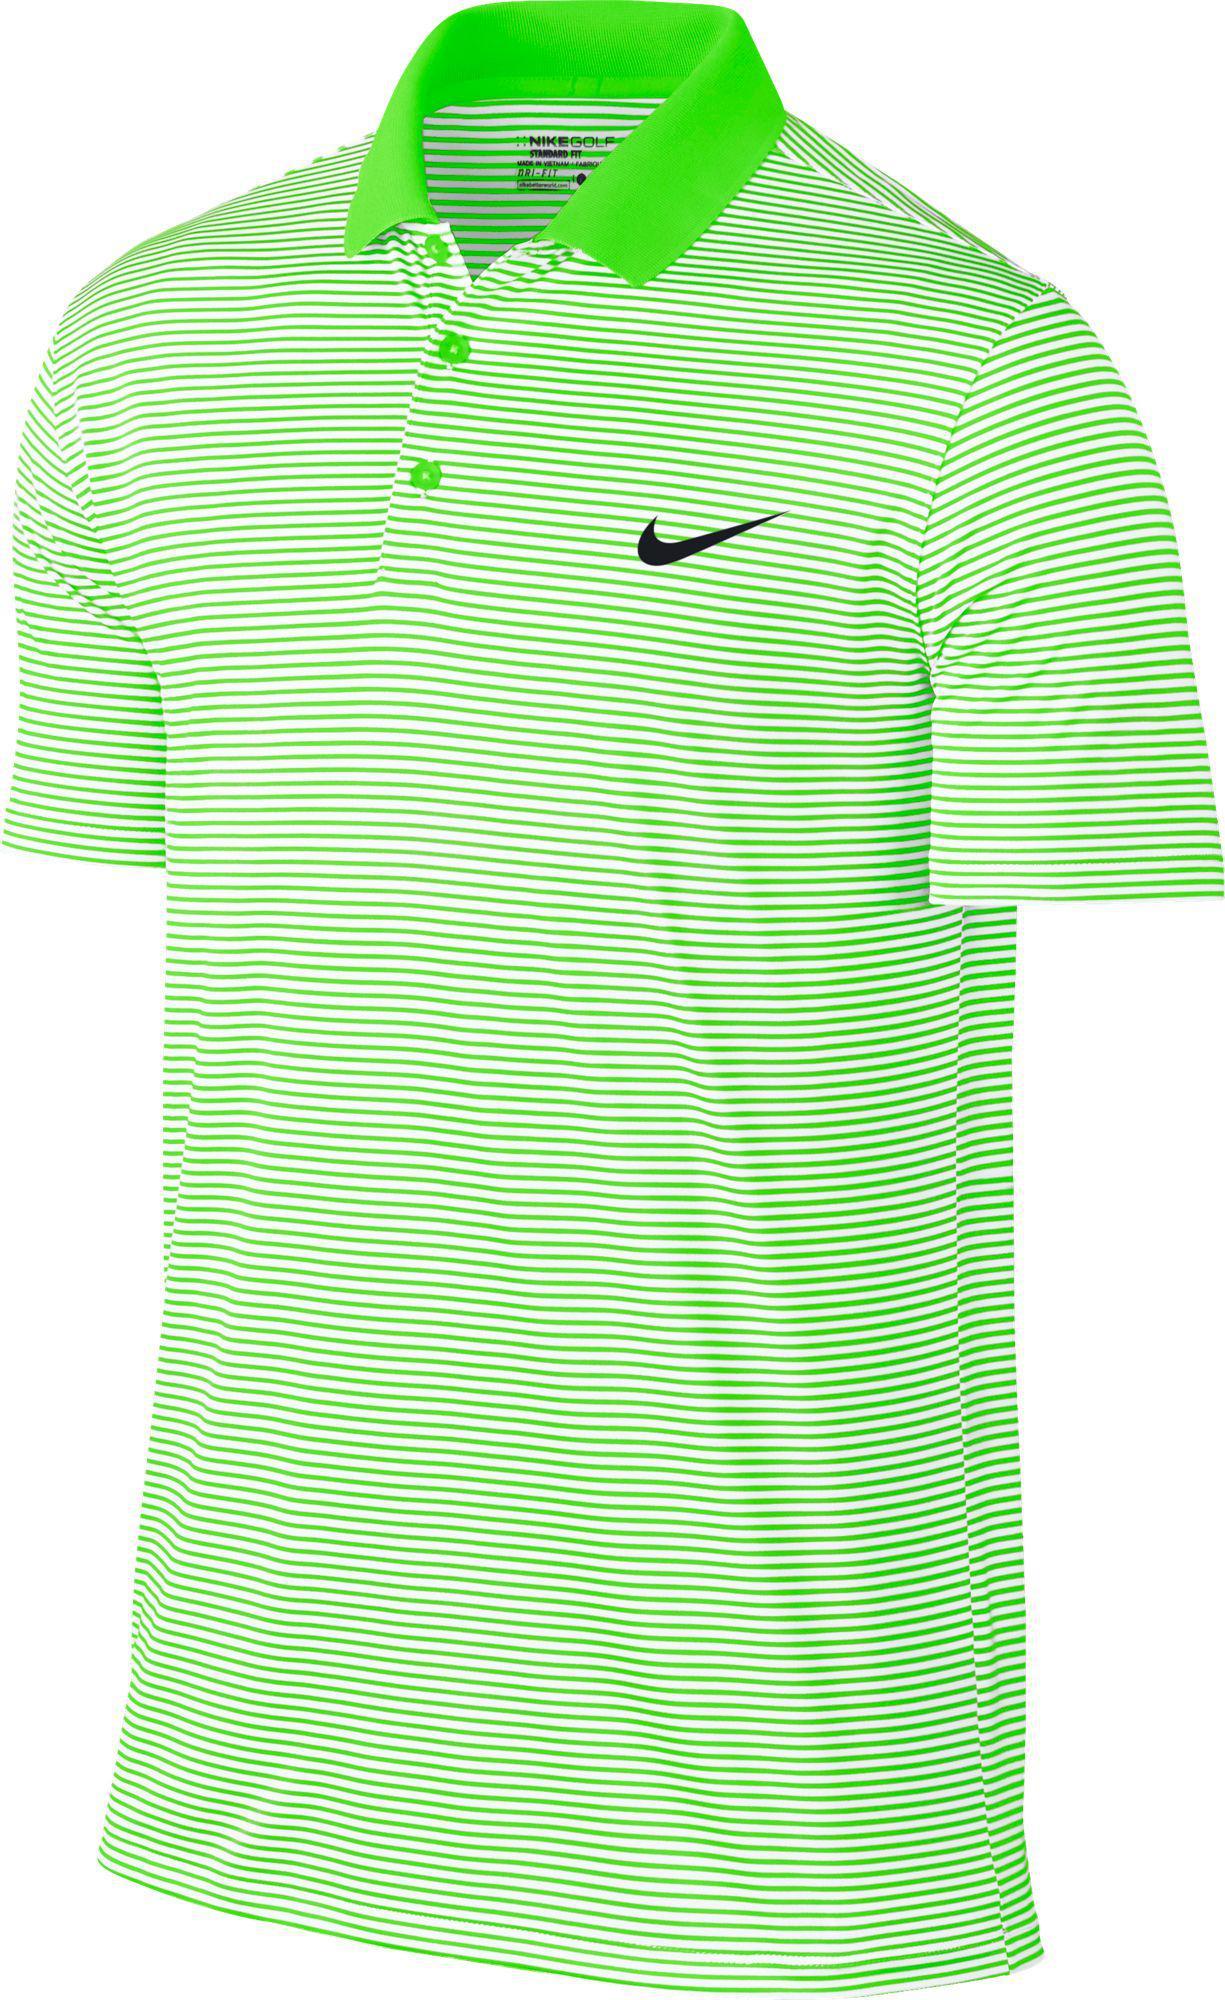 d0850bbb54 Nike Dri-fit Victory Mini Stripe Golf Polo in Green for Men - Lyst